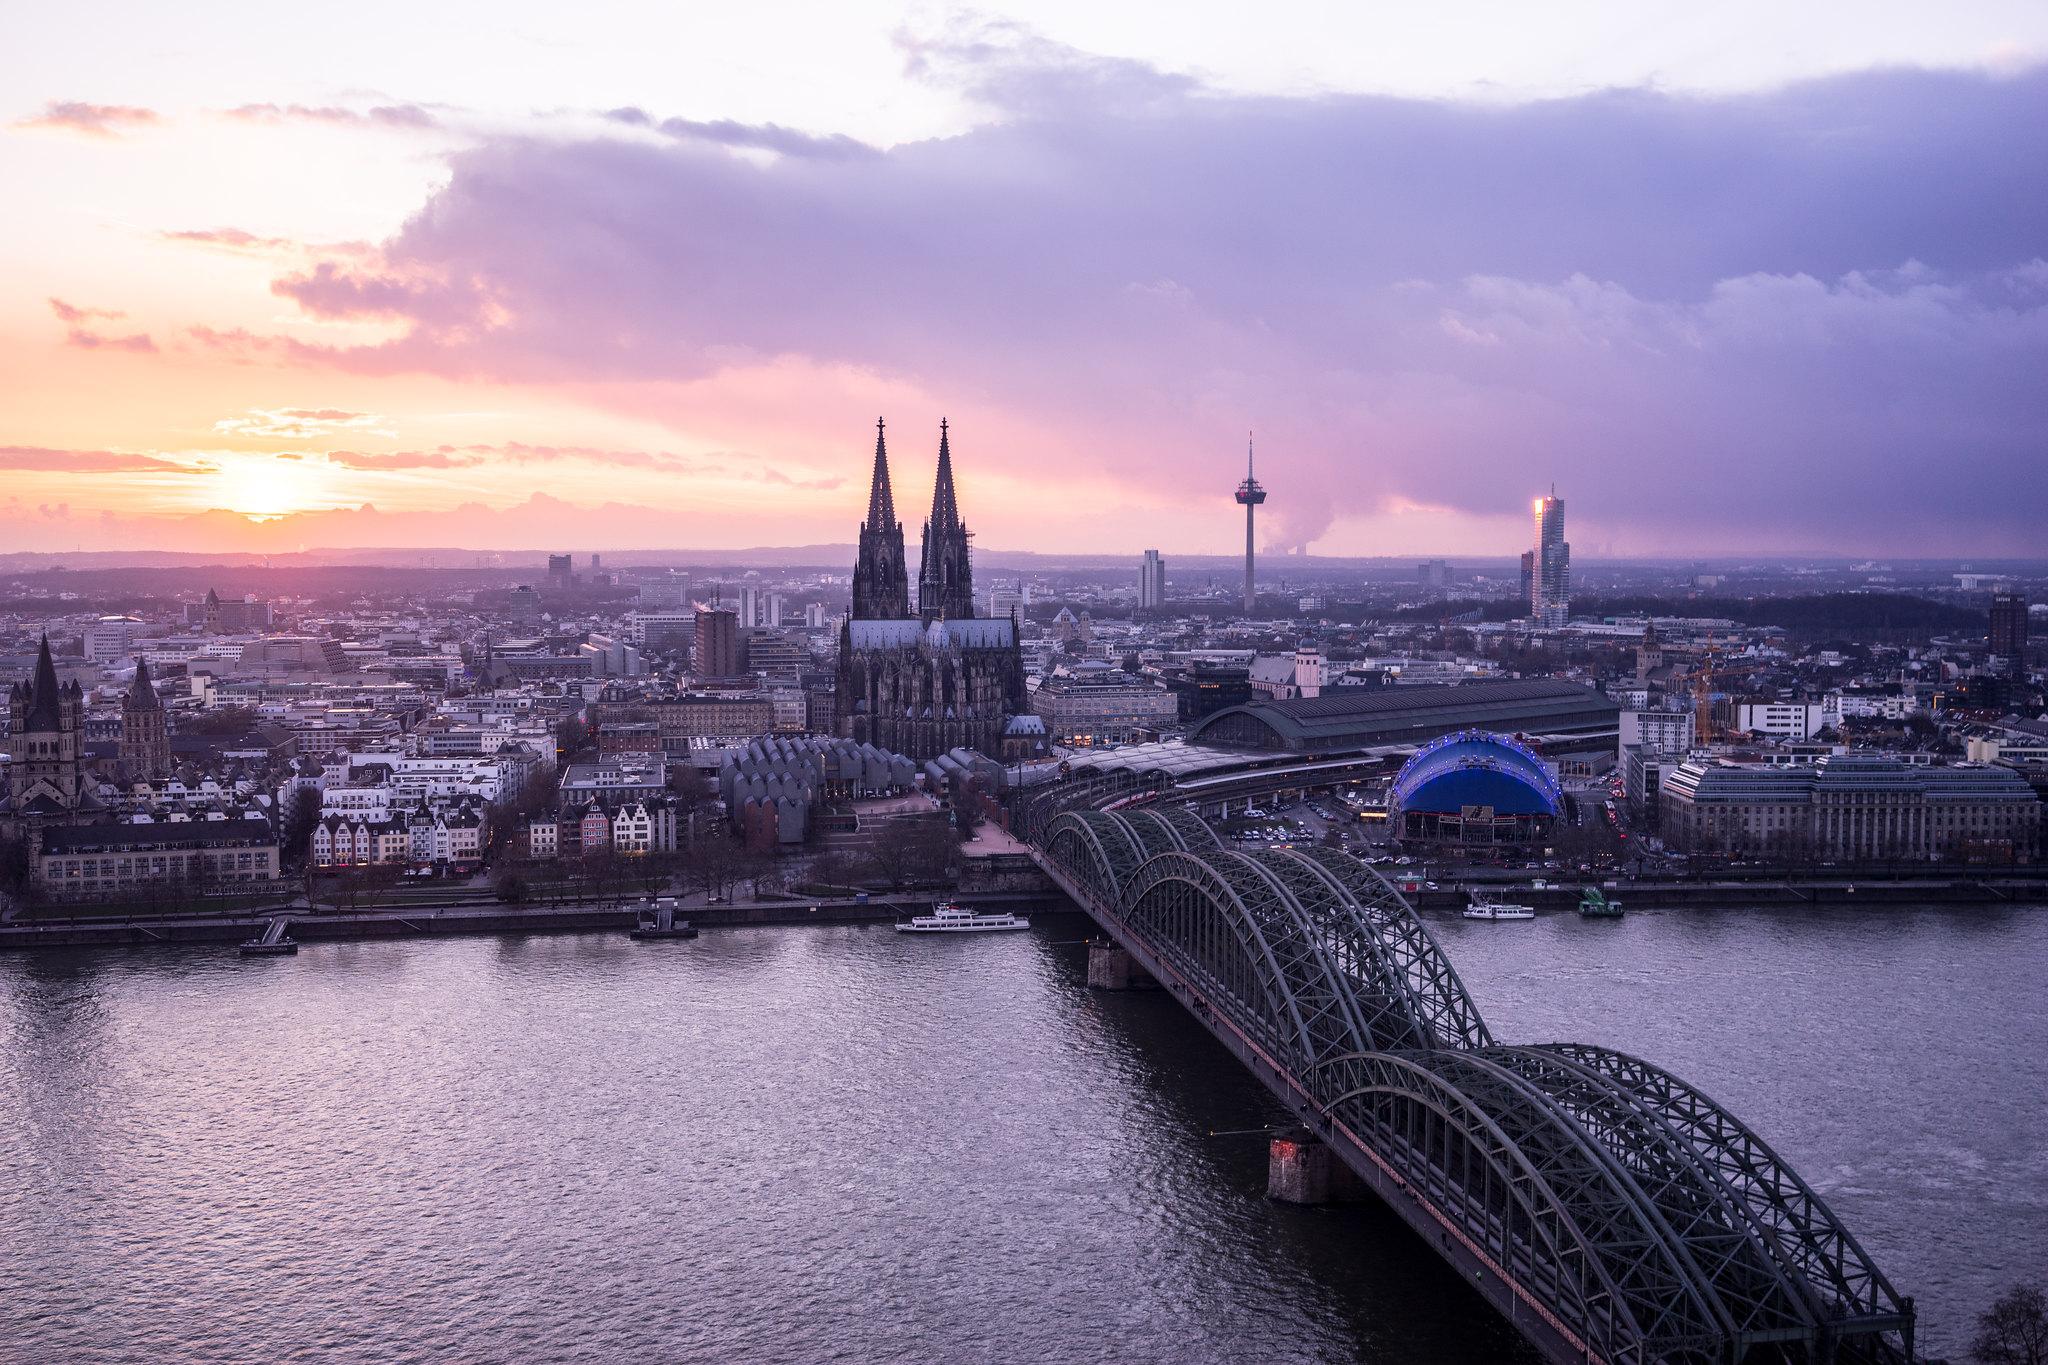 Koln, Germany | Wanderlust Chronicles